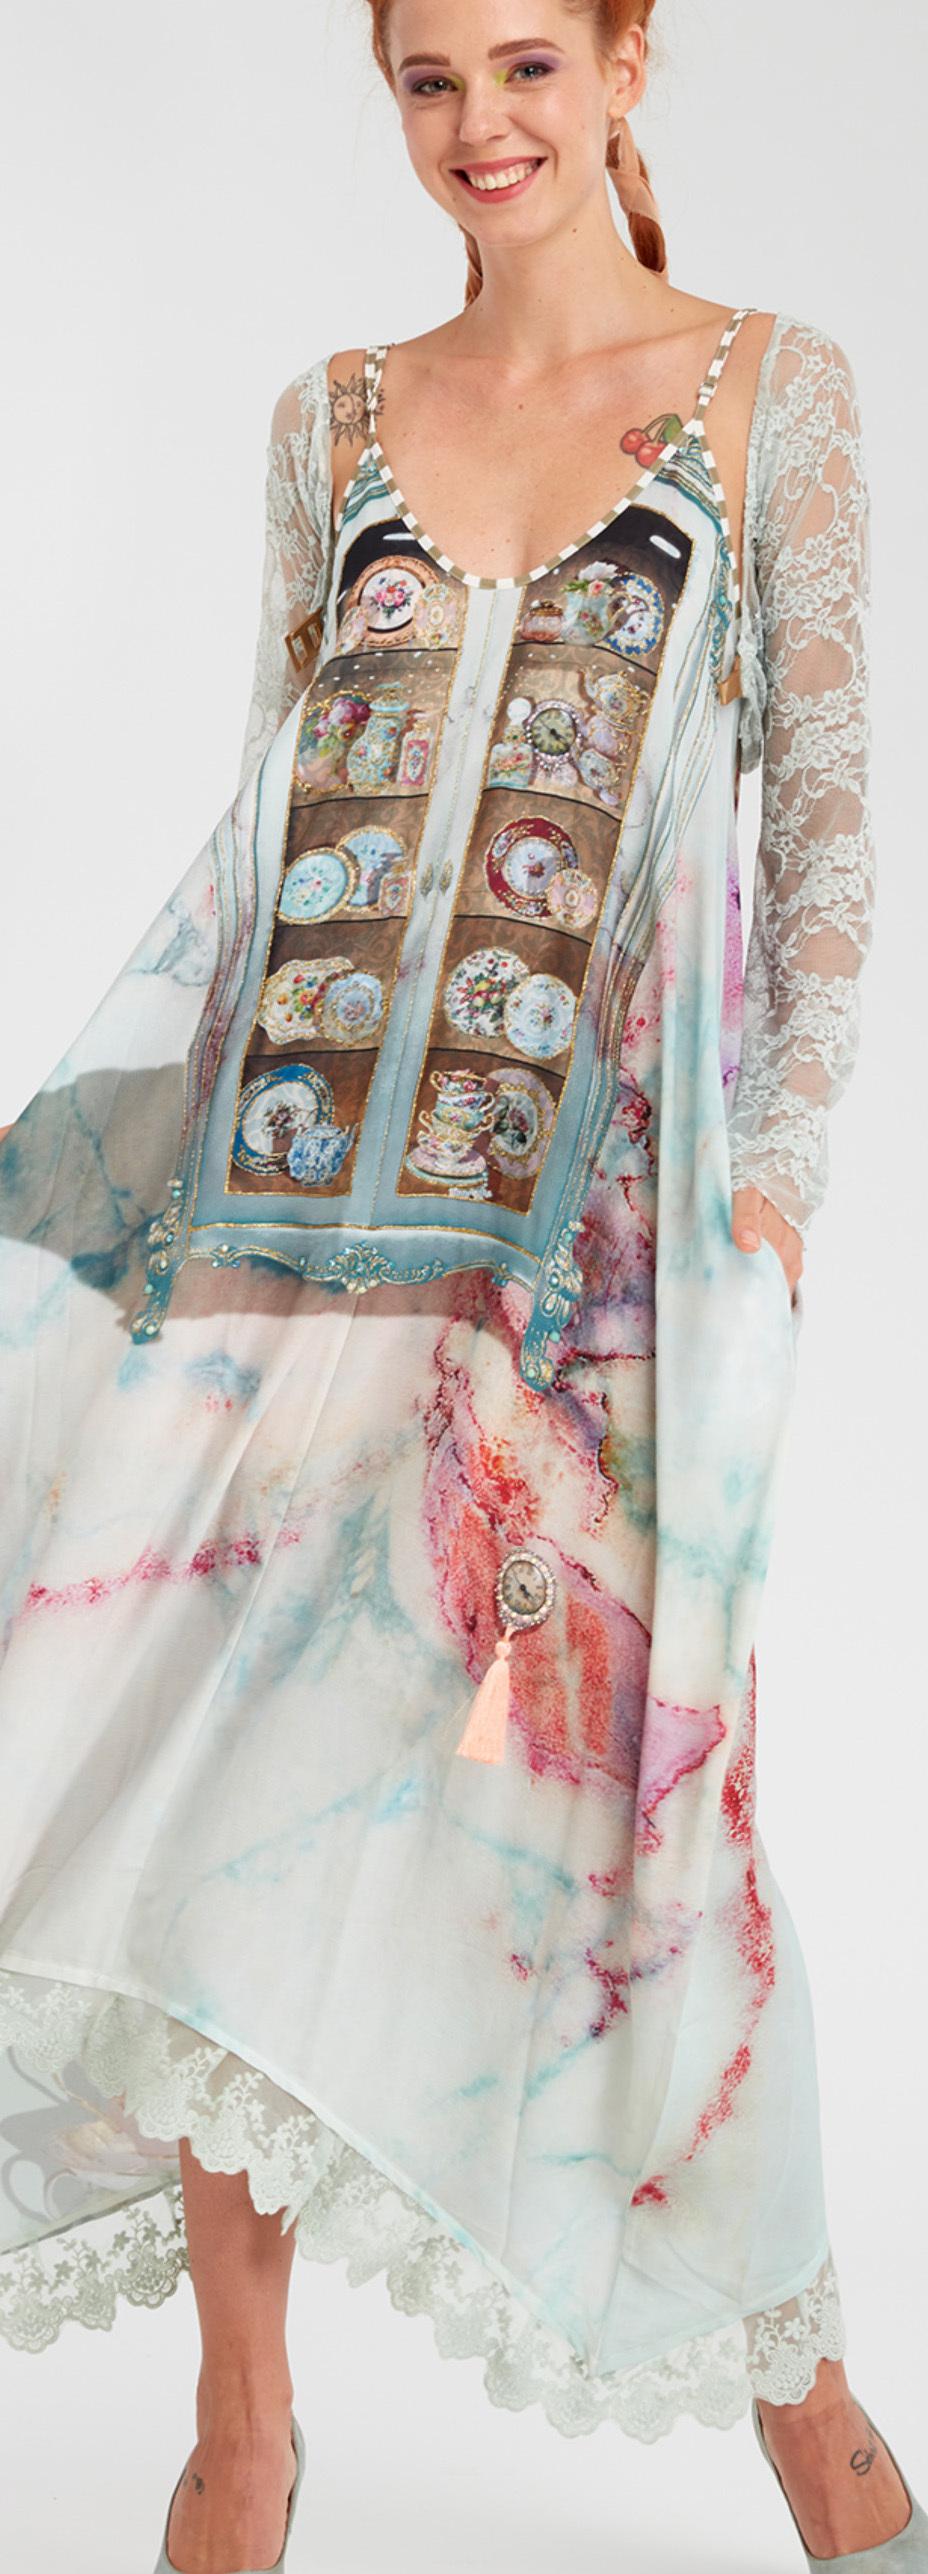 IPNG: Inna Me Rose Reflection Illusion V-Cut Maxi Dress